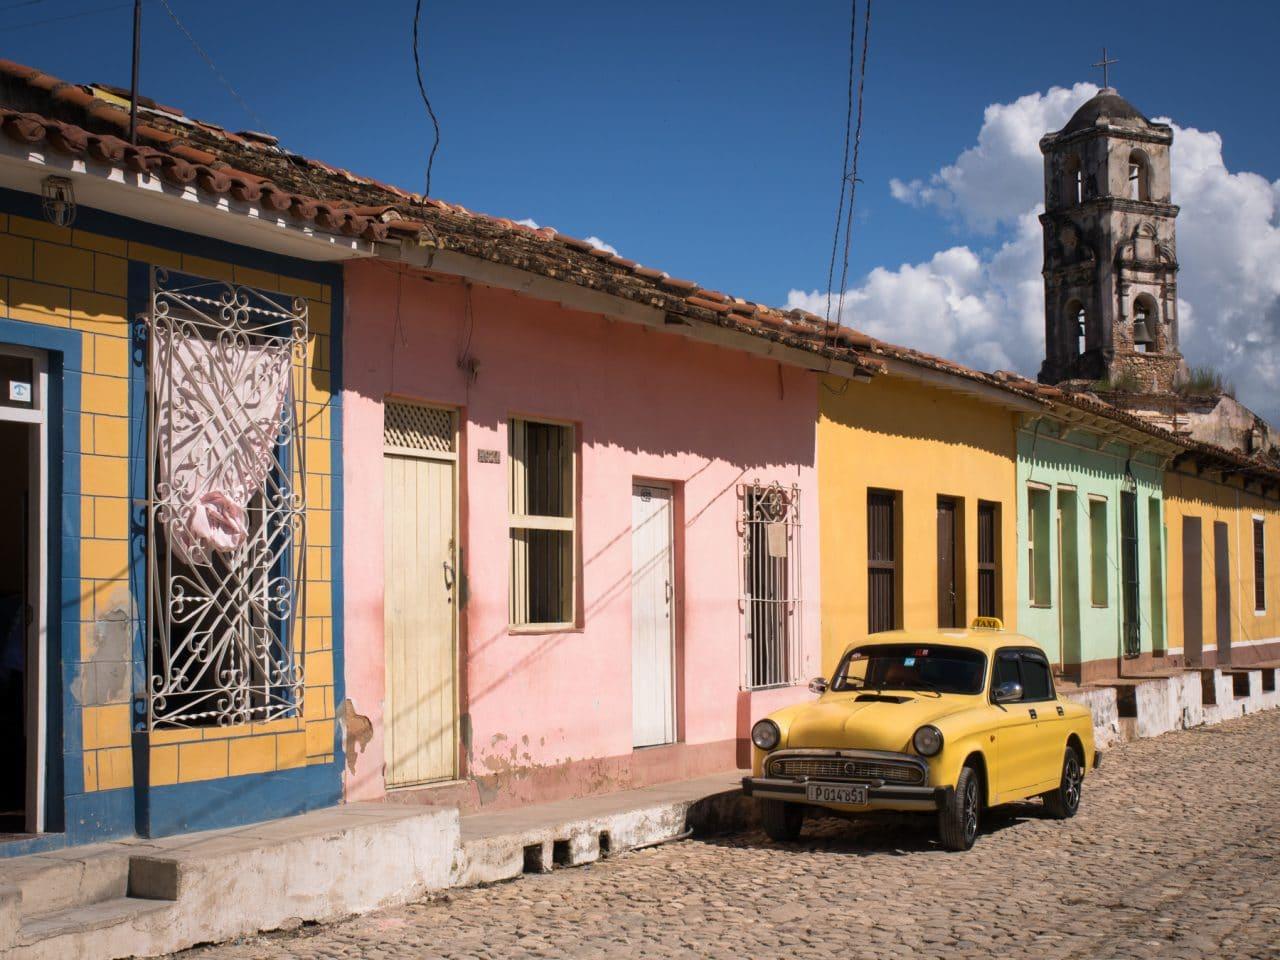 trinidad cuba images-cuba voitures anciennes-les rue de trinidad